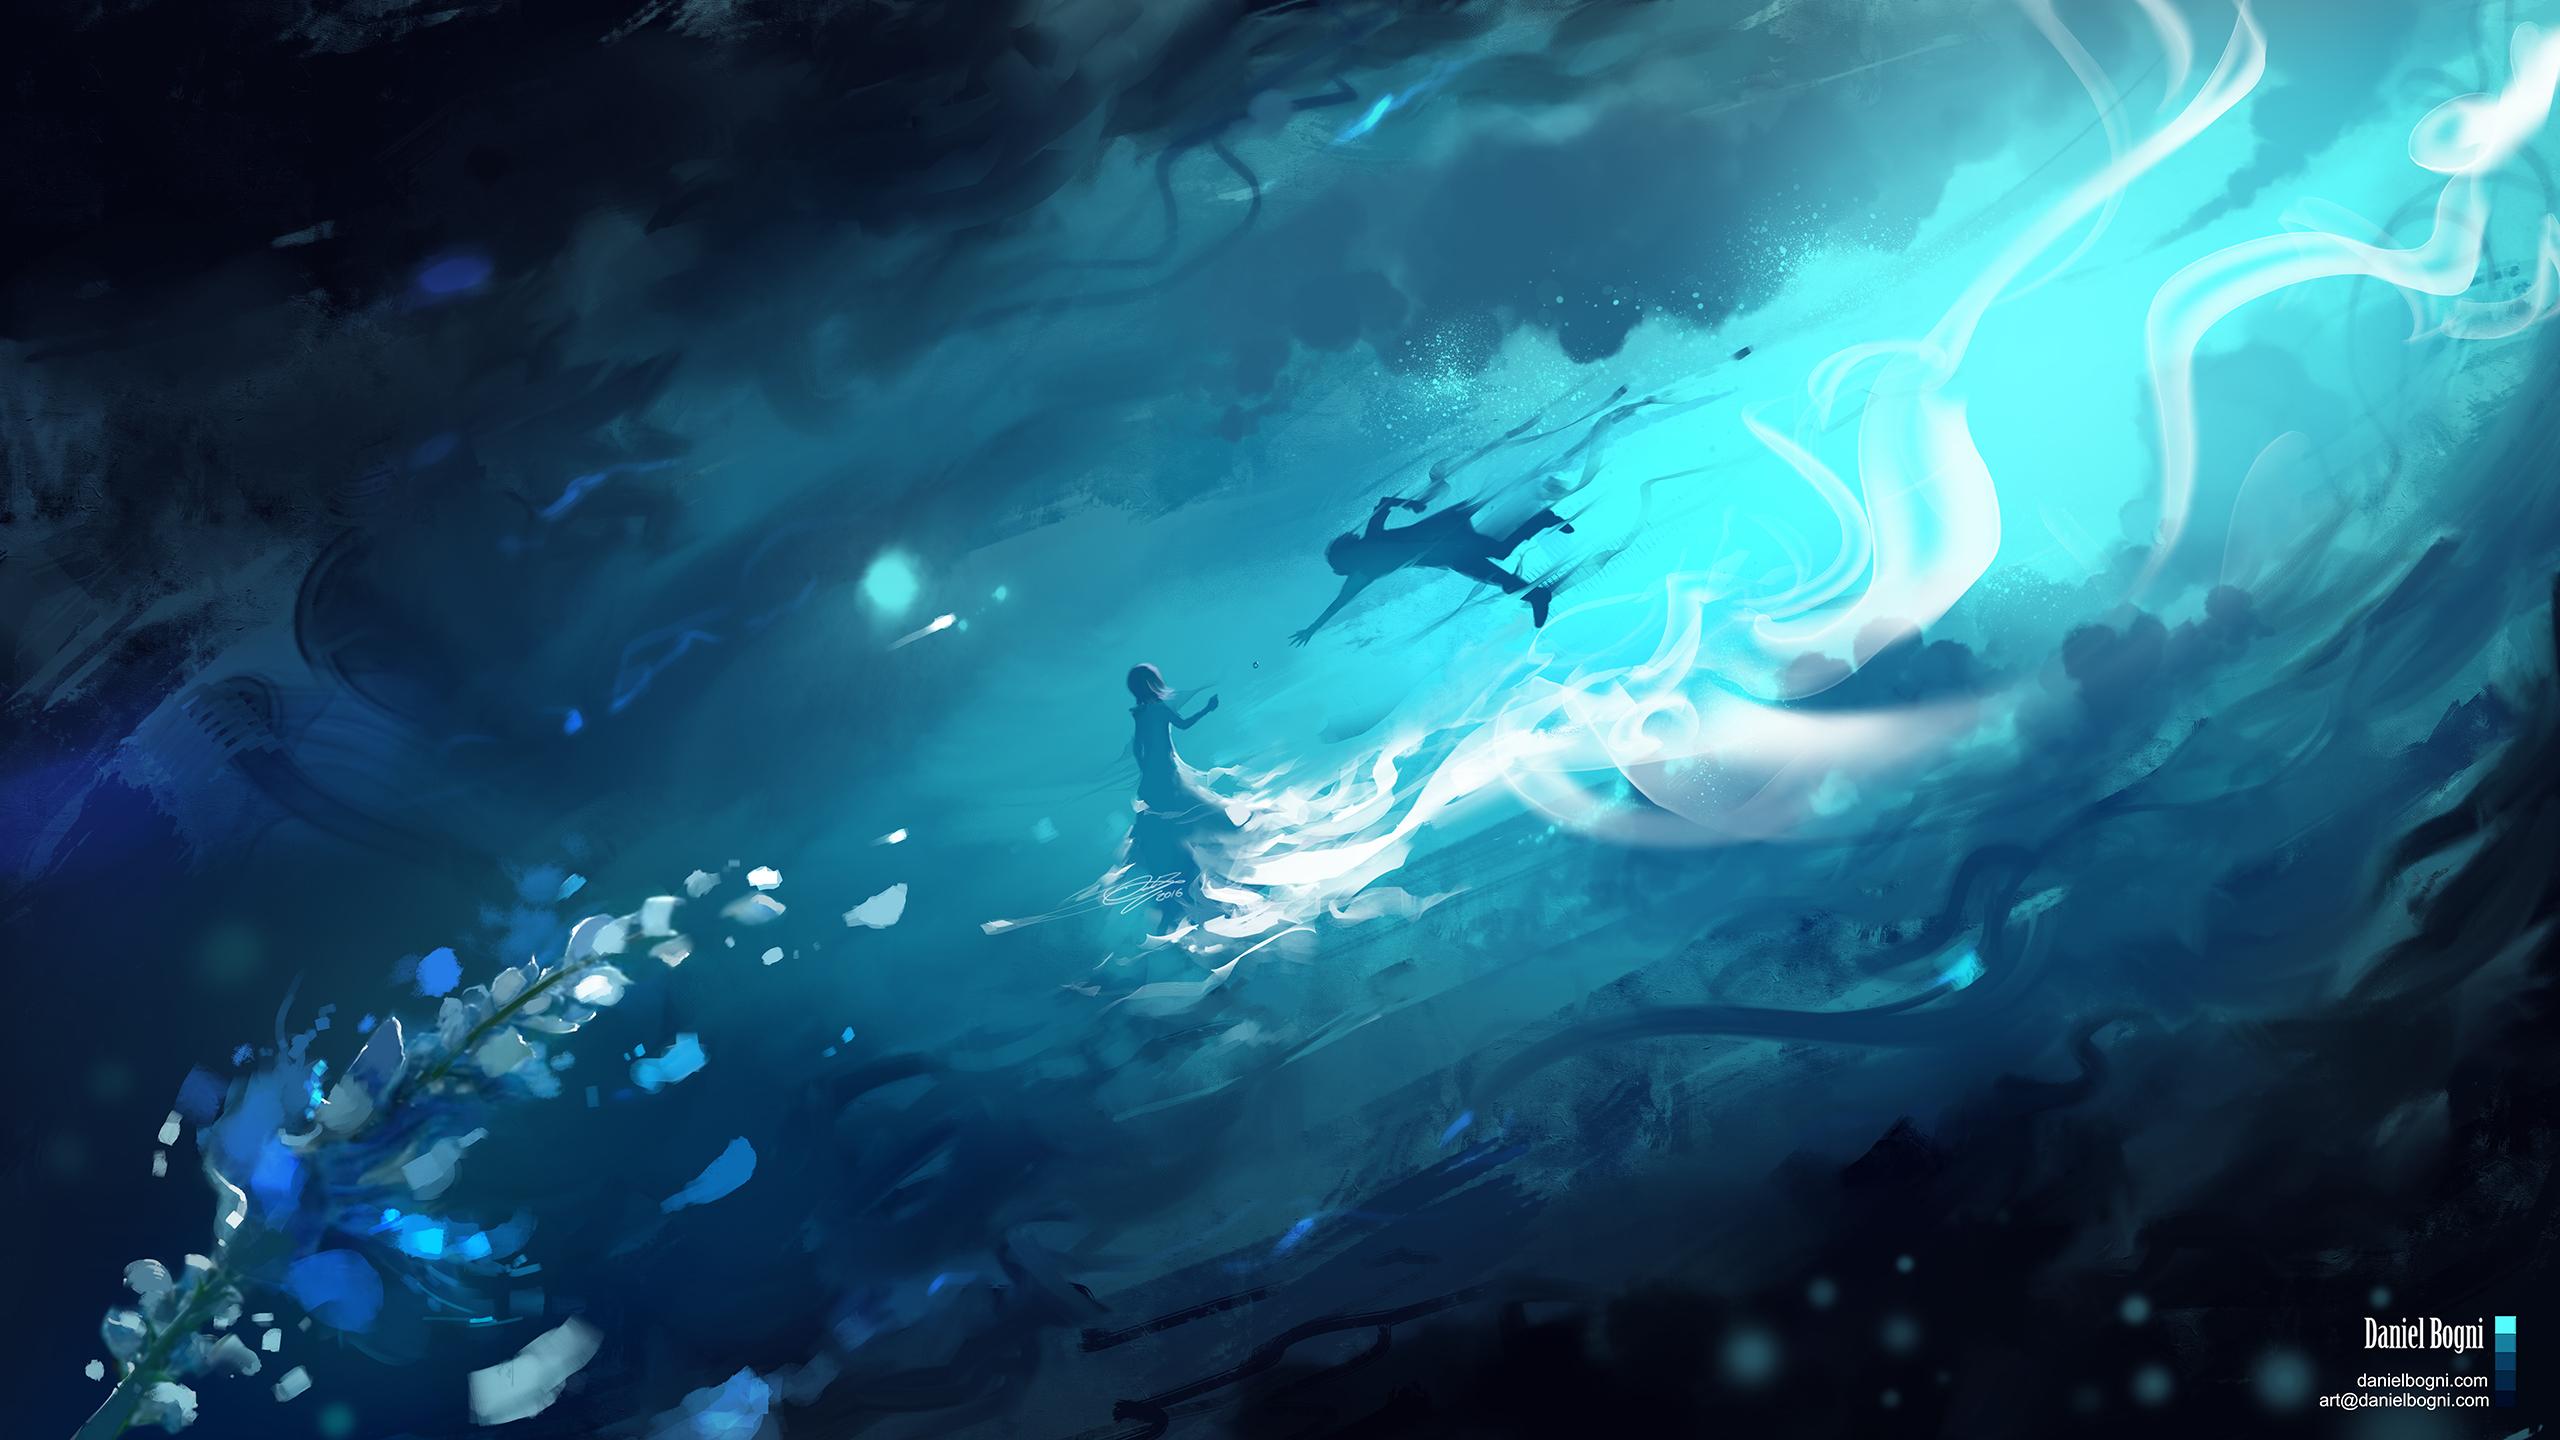 Final Fantasy XV HD Wallpaper | Hintergrund | 2560x1440 ...